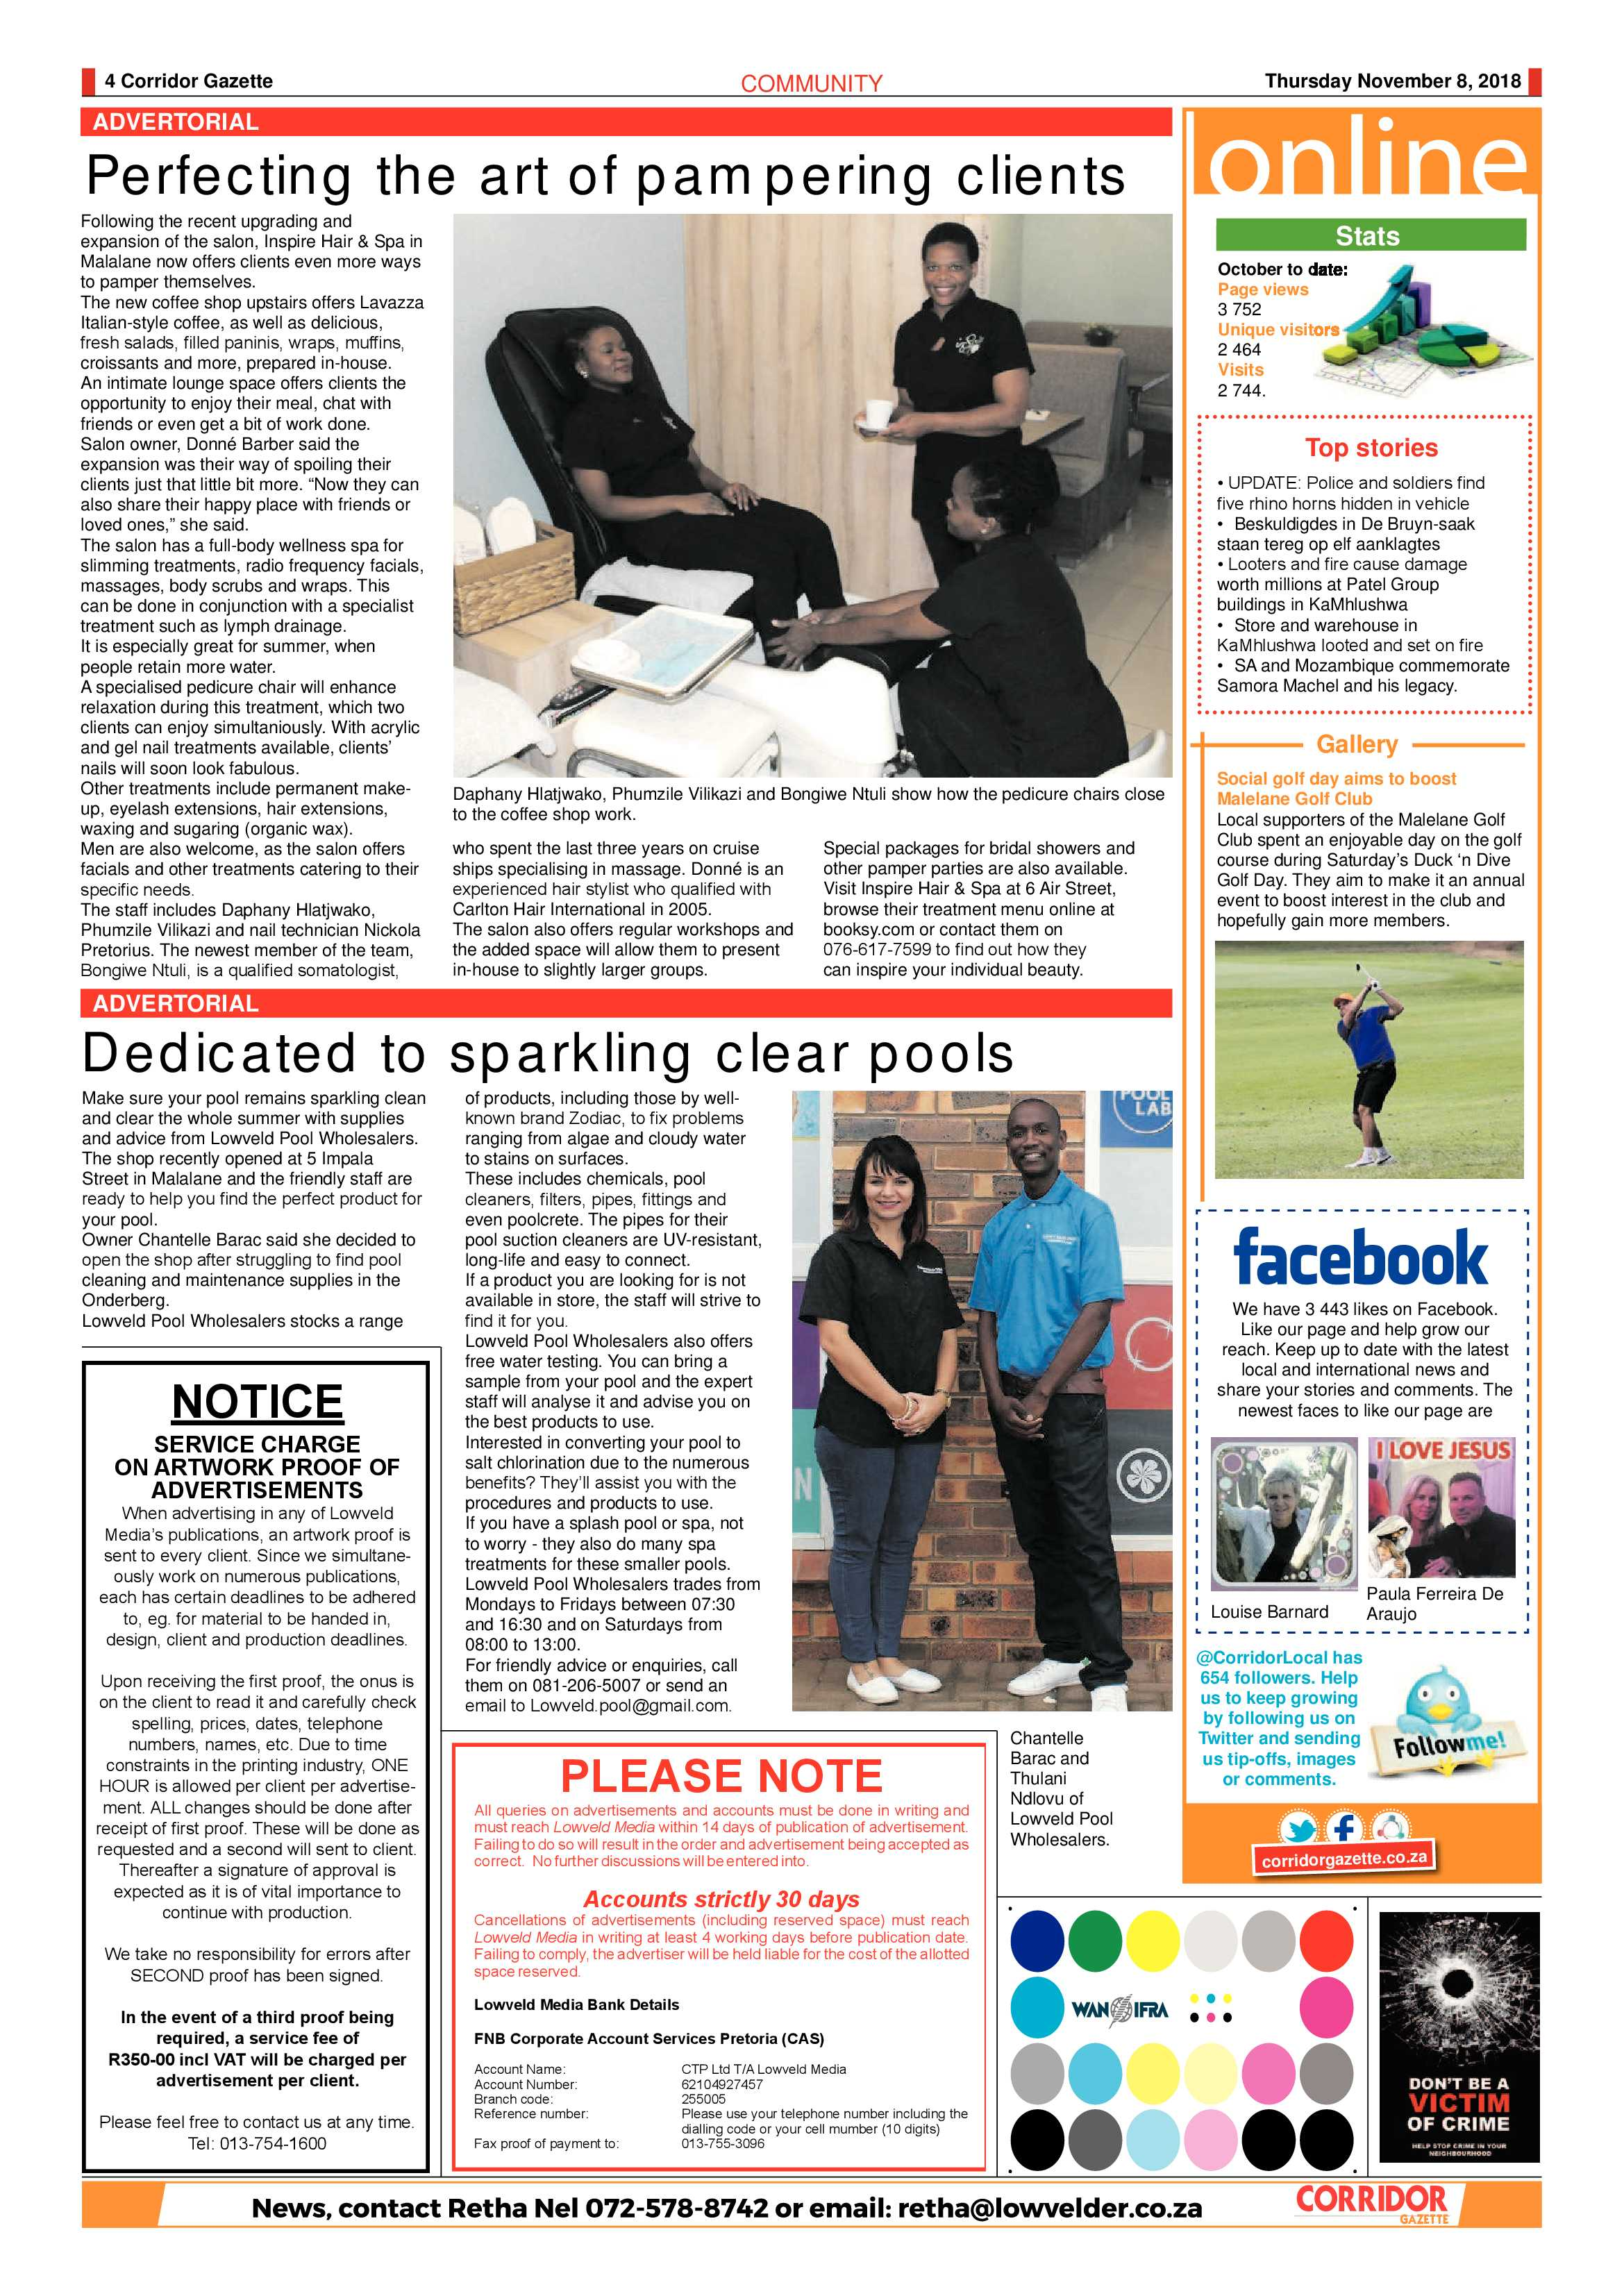 corridor-gazette-8-november-2018-epapers-page-4